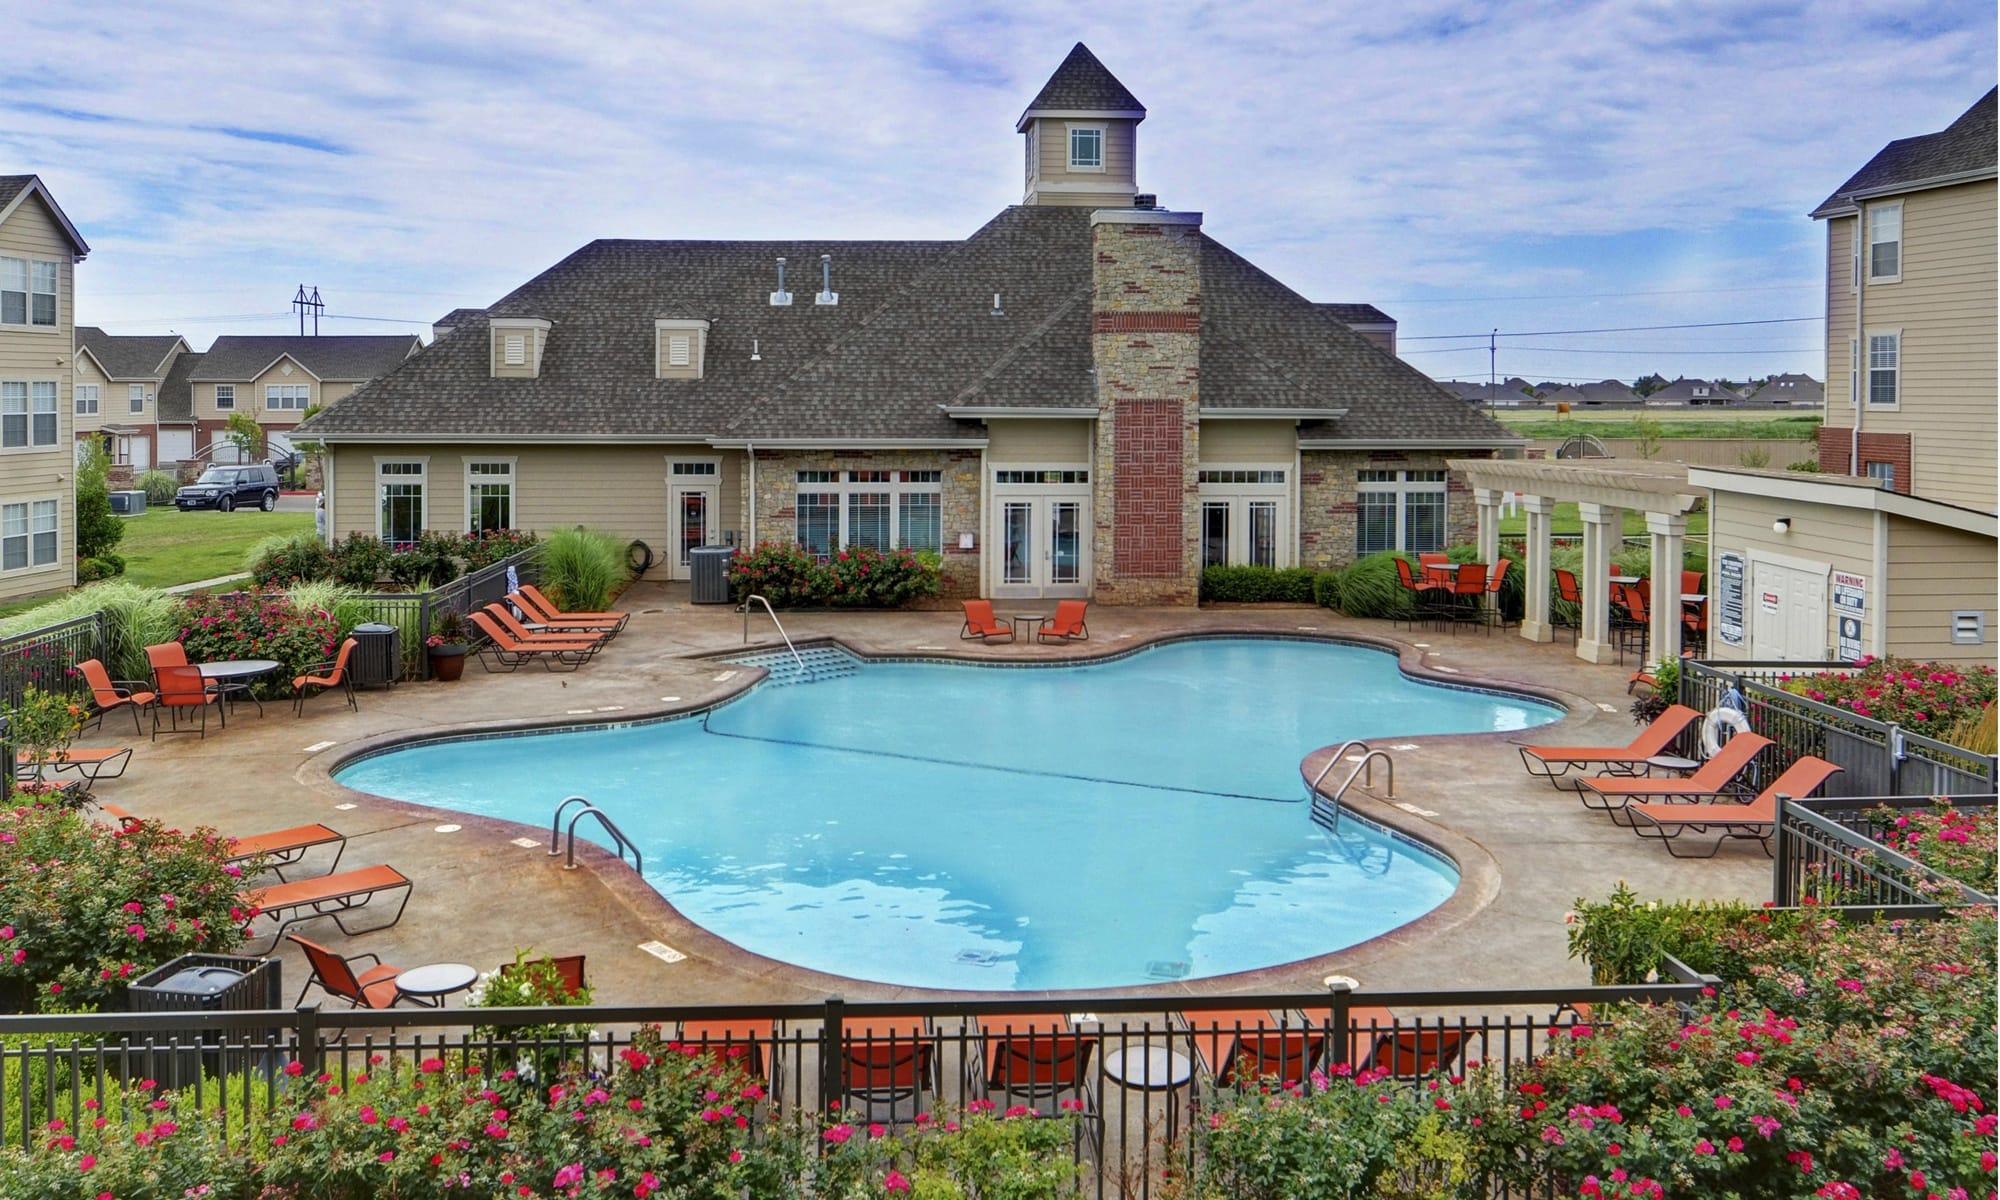 3 Bedroom Houses For Rent In Amarillo Tx 3 Bedroom Houses For Rent In Amarillo Tx 2018 3